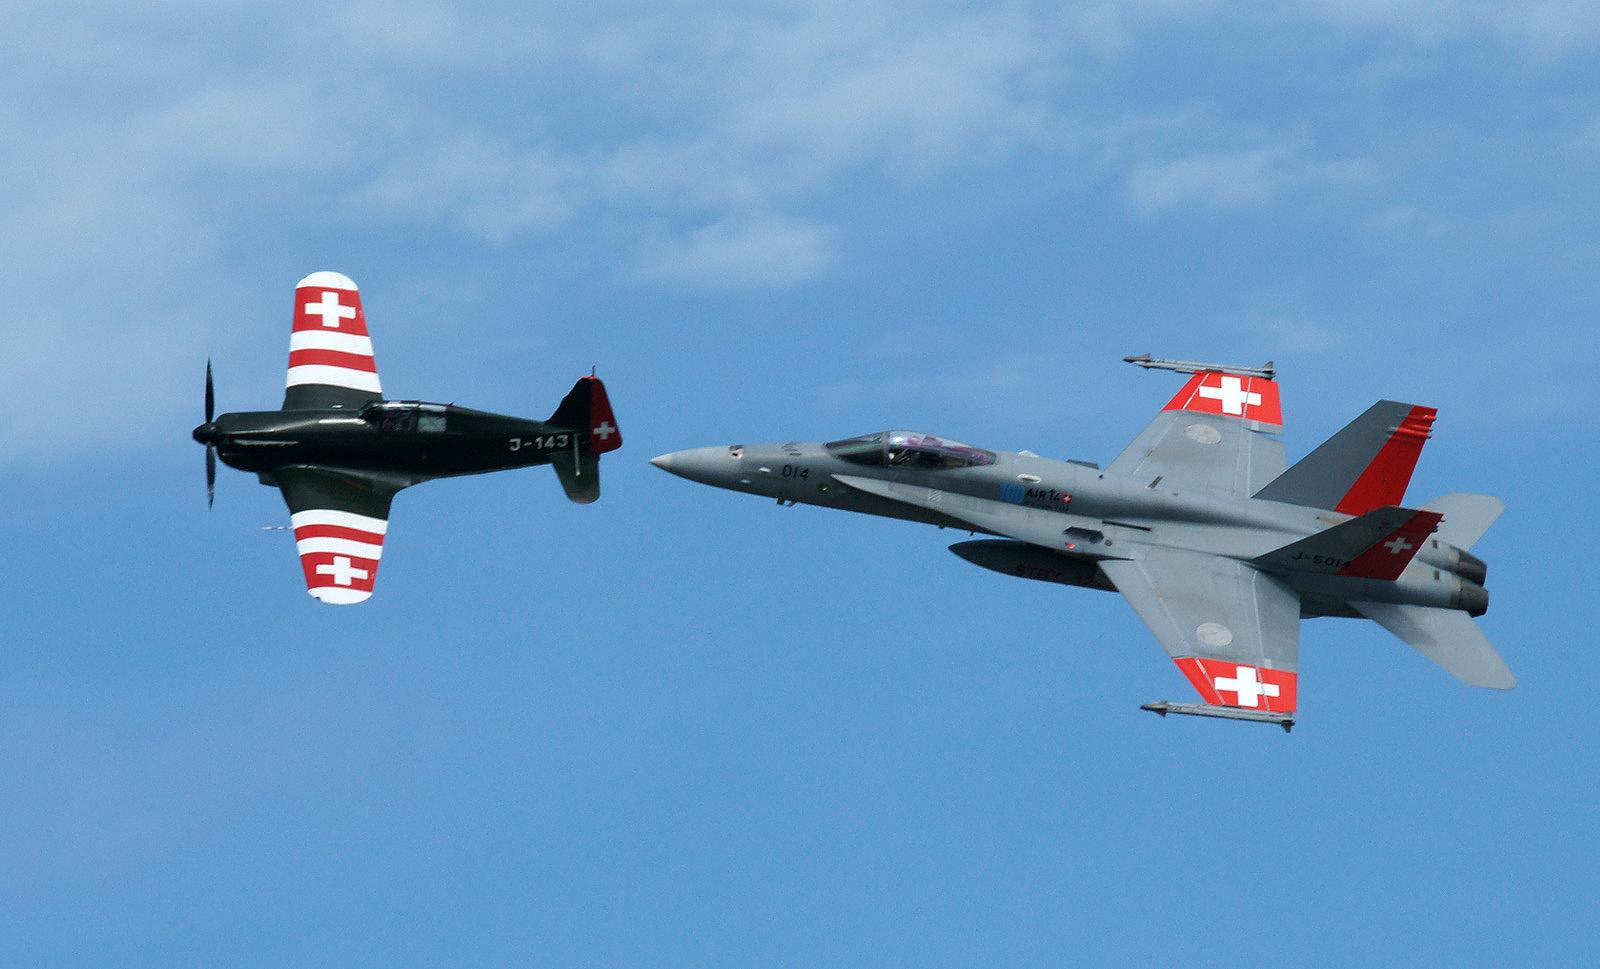 Morane D.3800 and F-18C Hornet